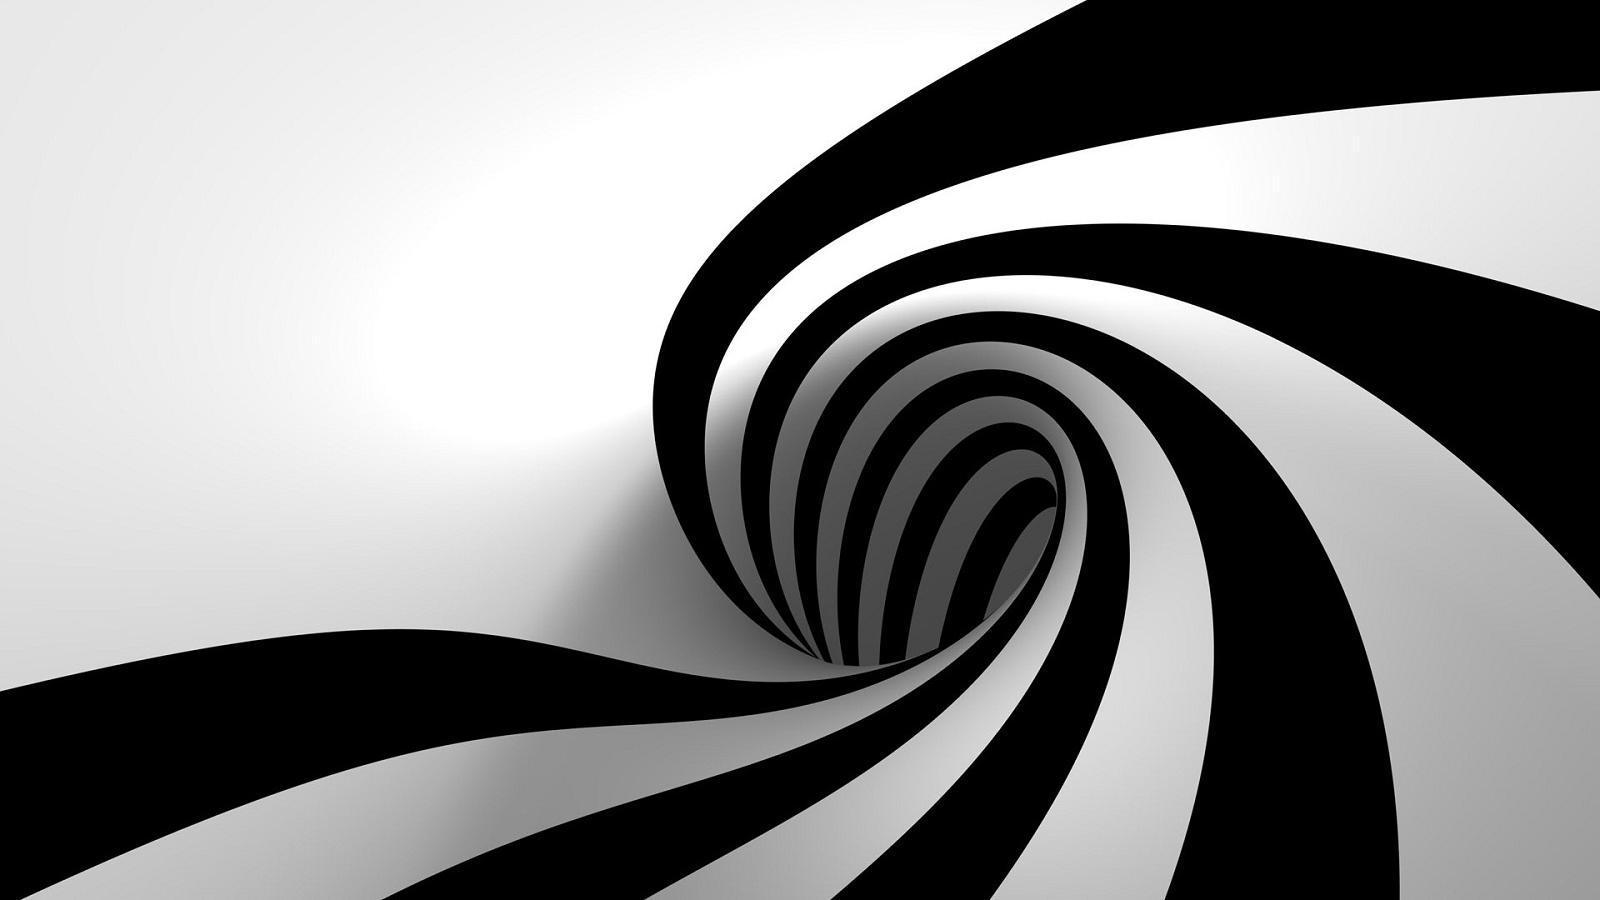 3d wallpaper design - Black Design Wallpaper 22 Free Hd Wallpaper